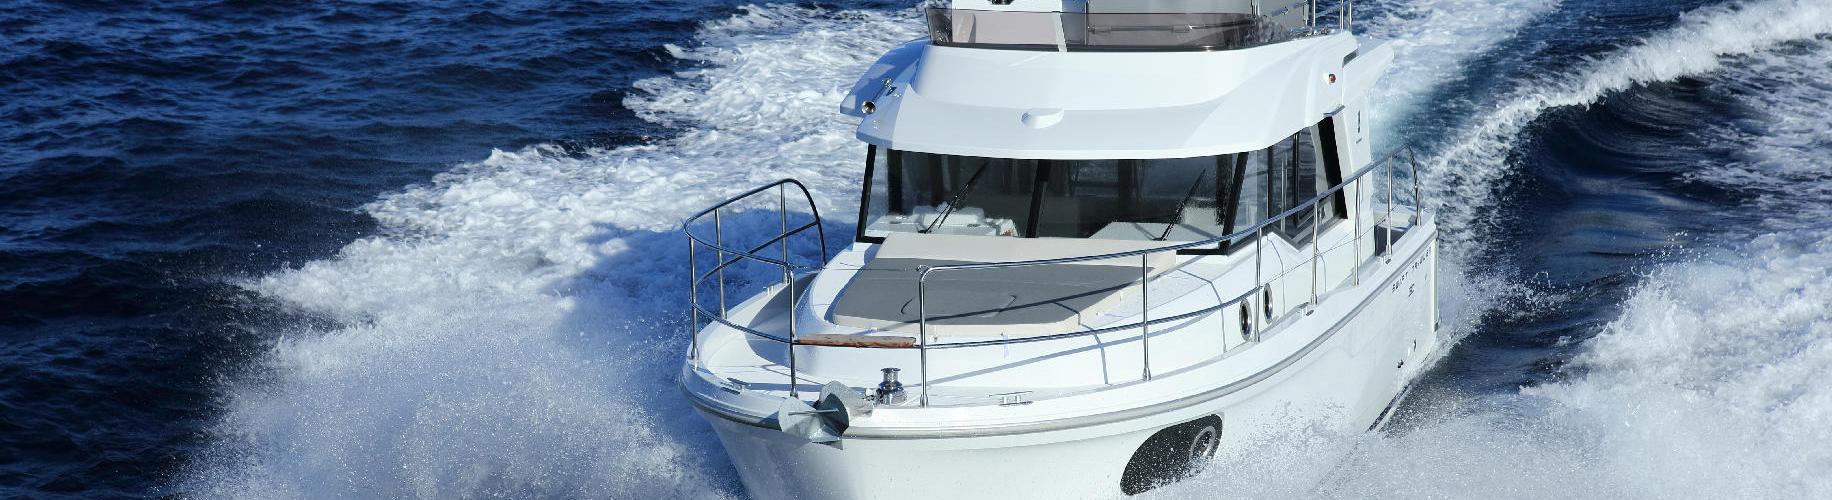 motor boat Swift Trawler 30